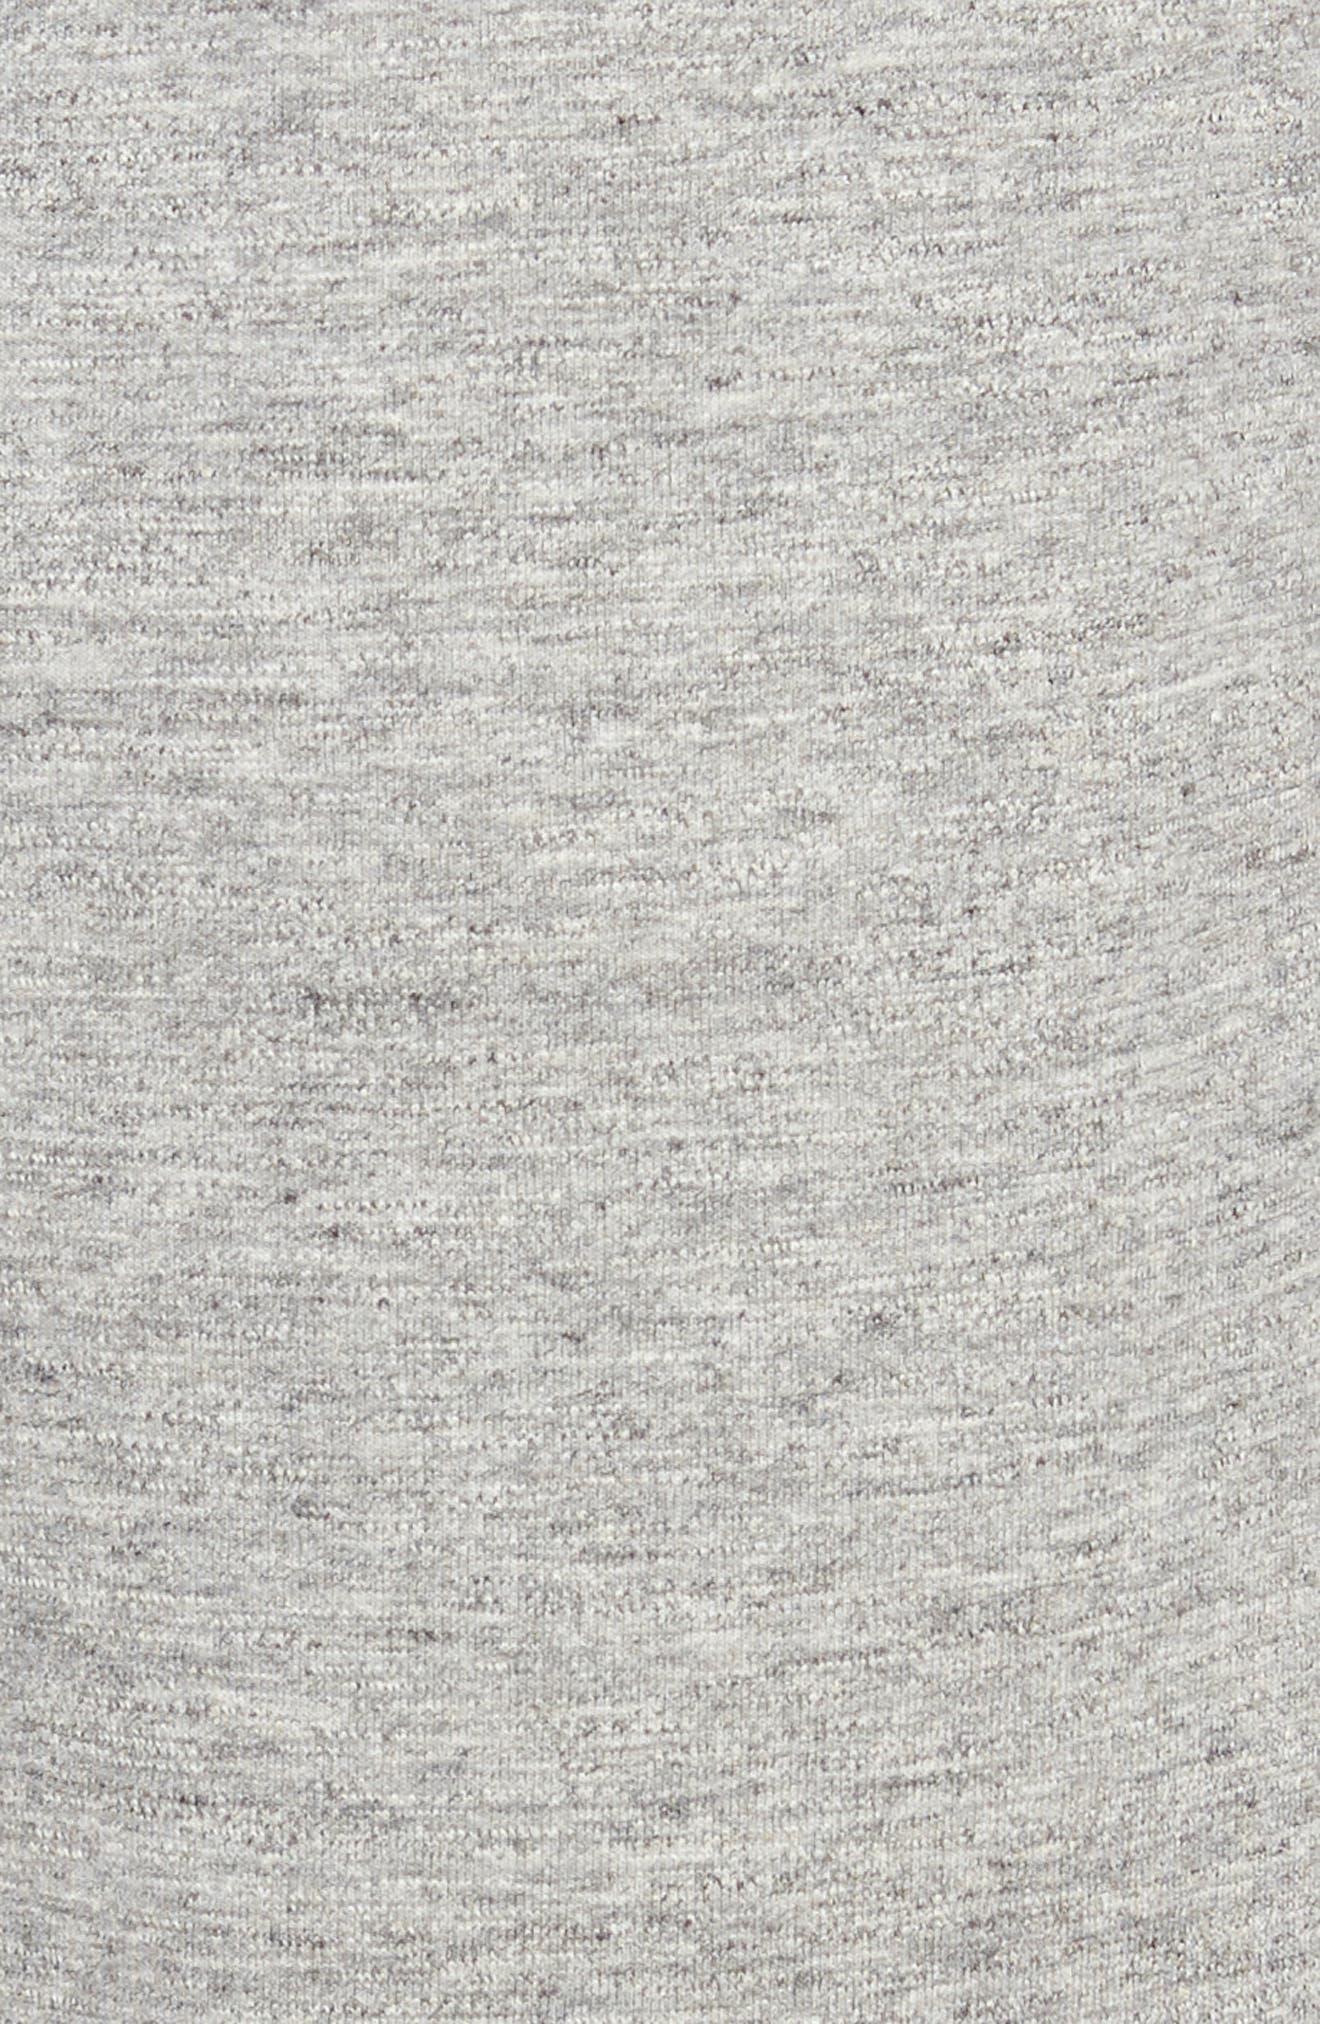 Arcanite Jogger Pants,                             Alternate thumbnail 5, color,                             GREY WOLF MELANGE